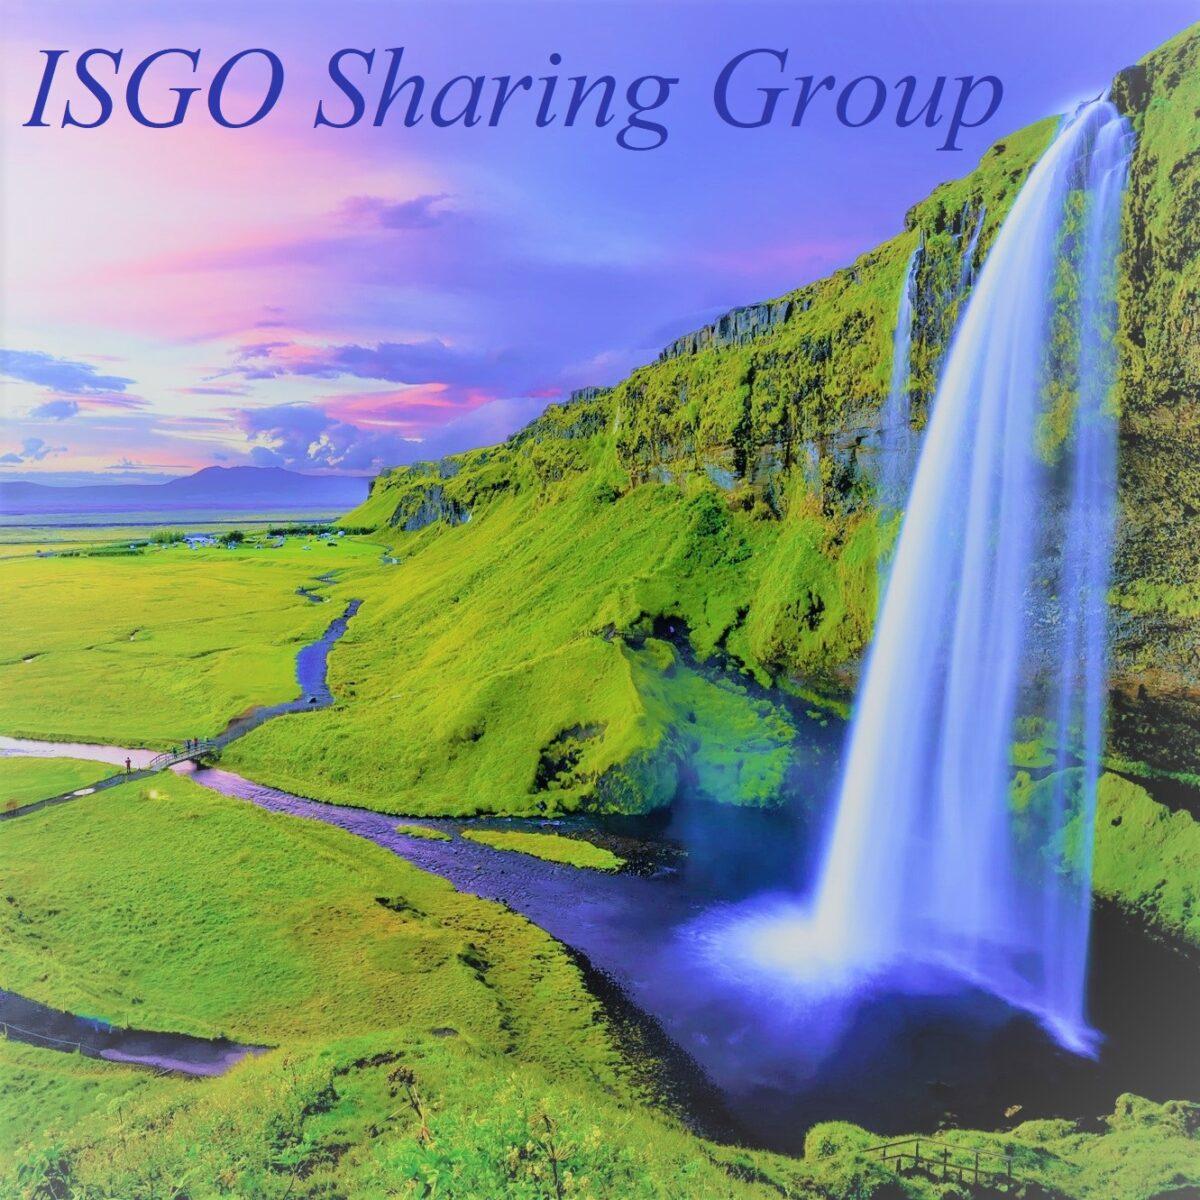 ISGO Sharing Group